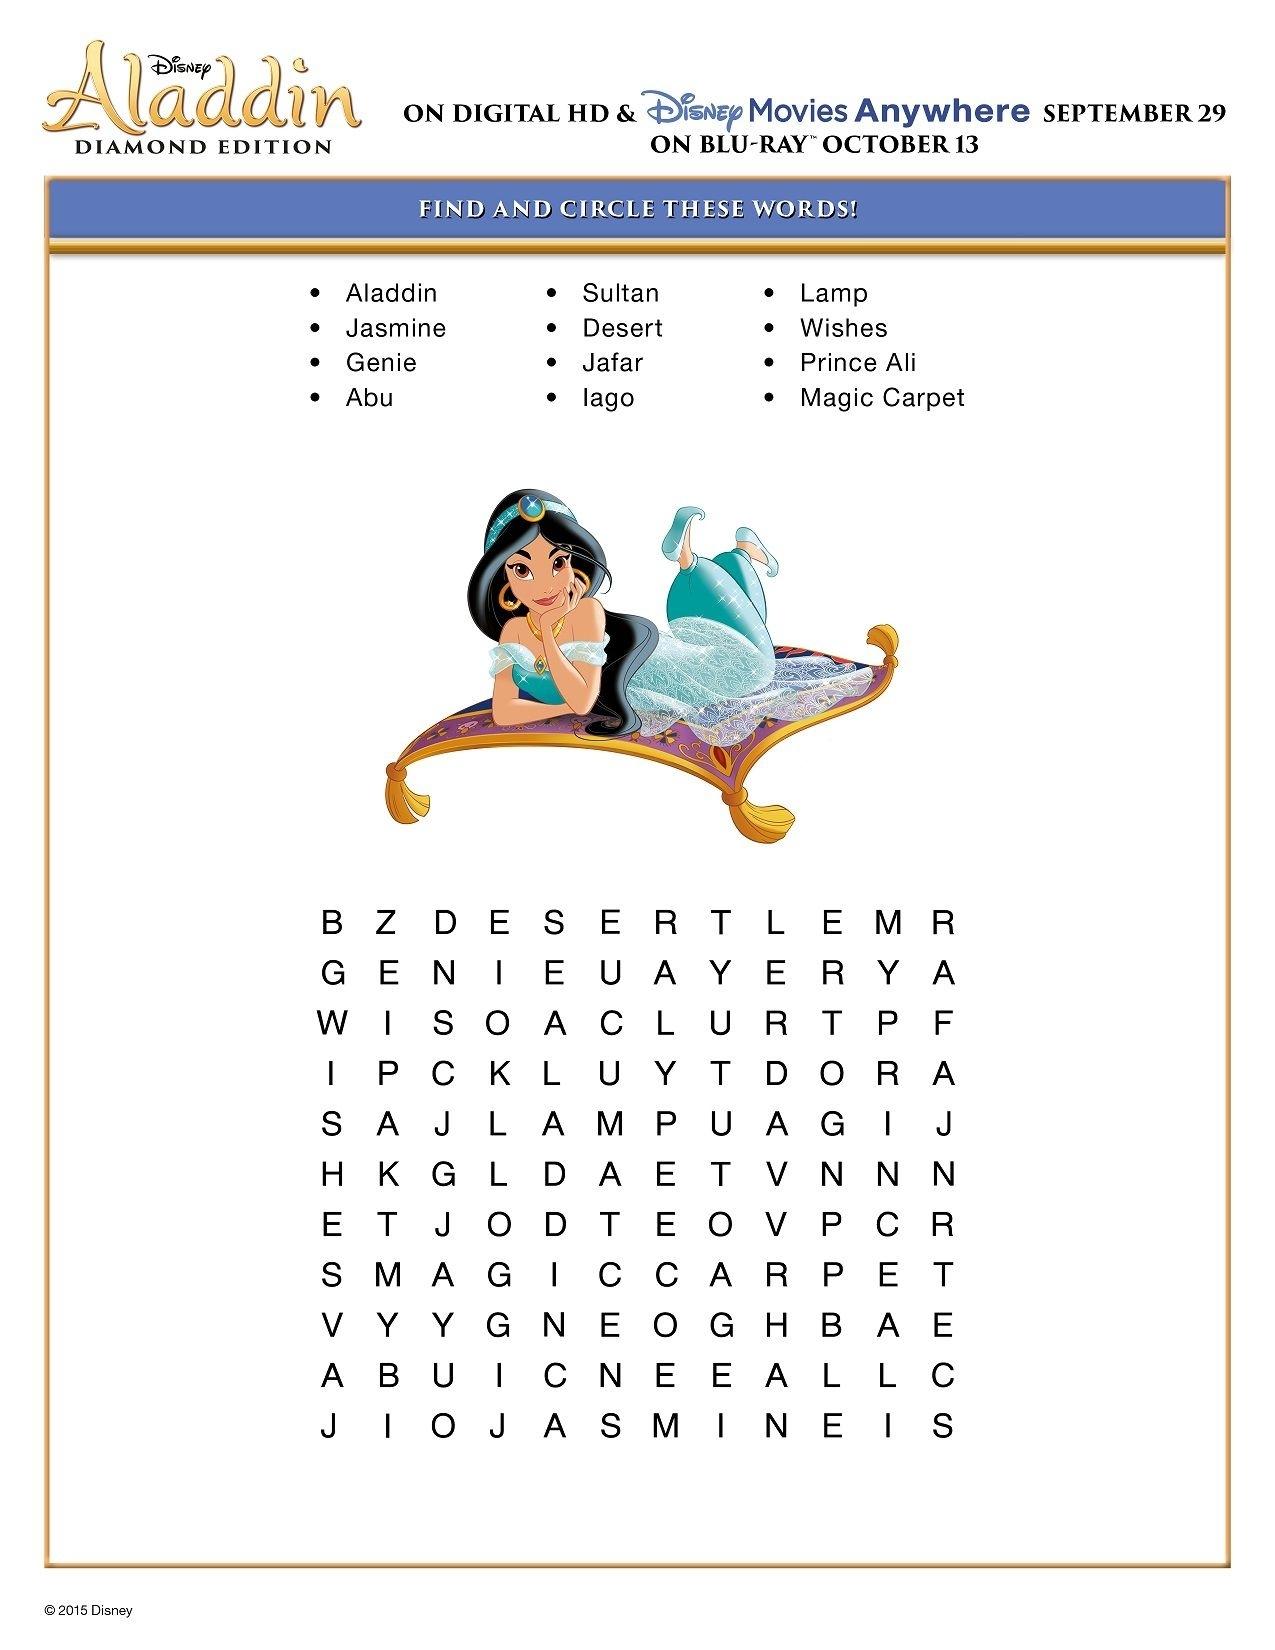 Free Printable Disney Aladdin Activity Sheets   Jasmine/aladdin with regard to Disney Princess Word Search Printable